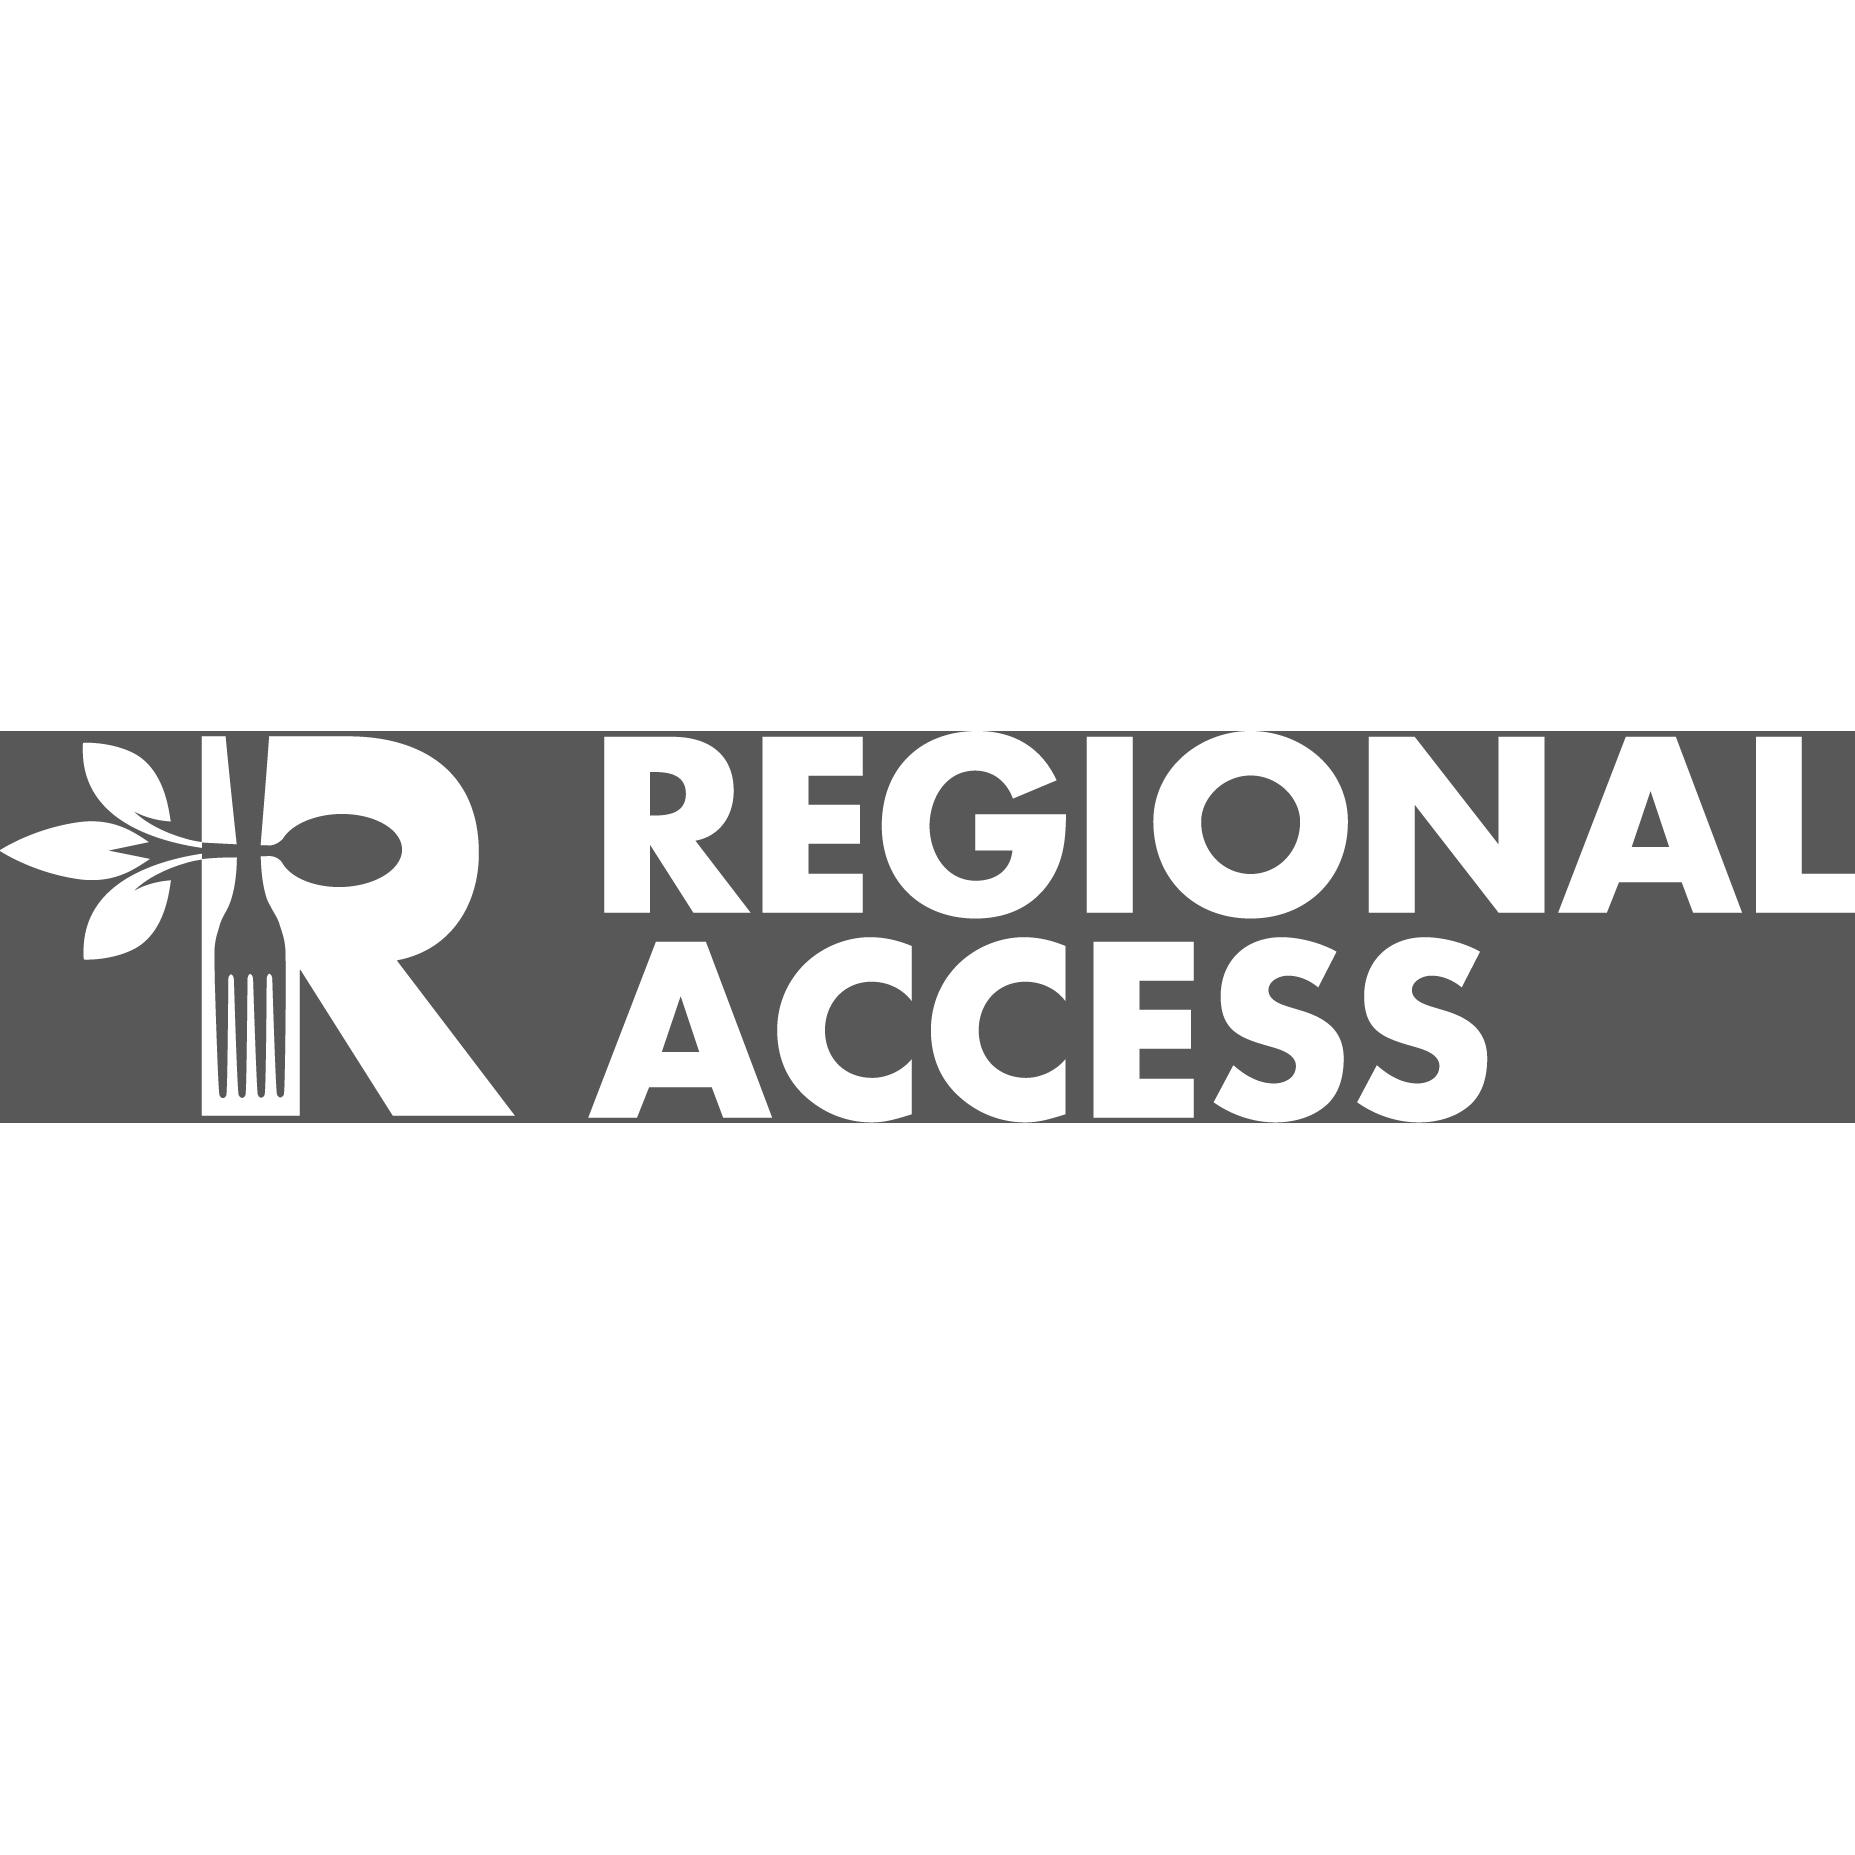 New York Regional Access